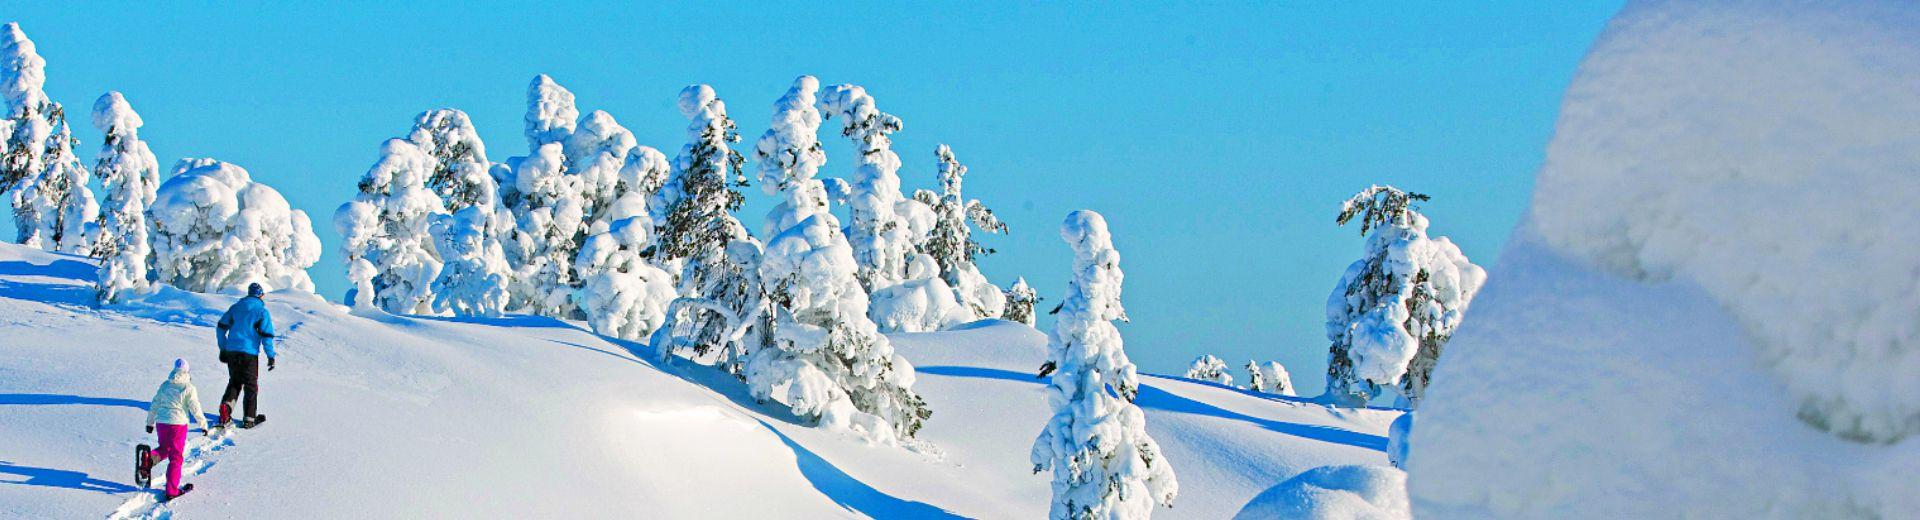 Winterabenteuer im Norden Finnlands